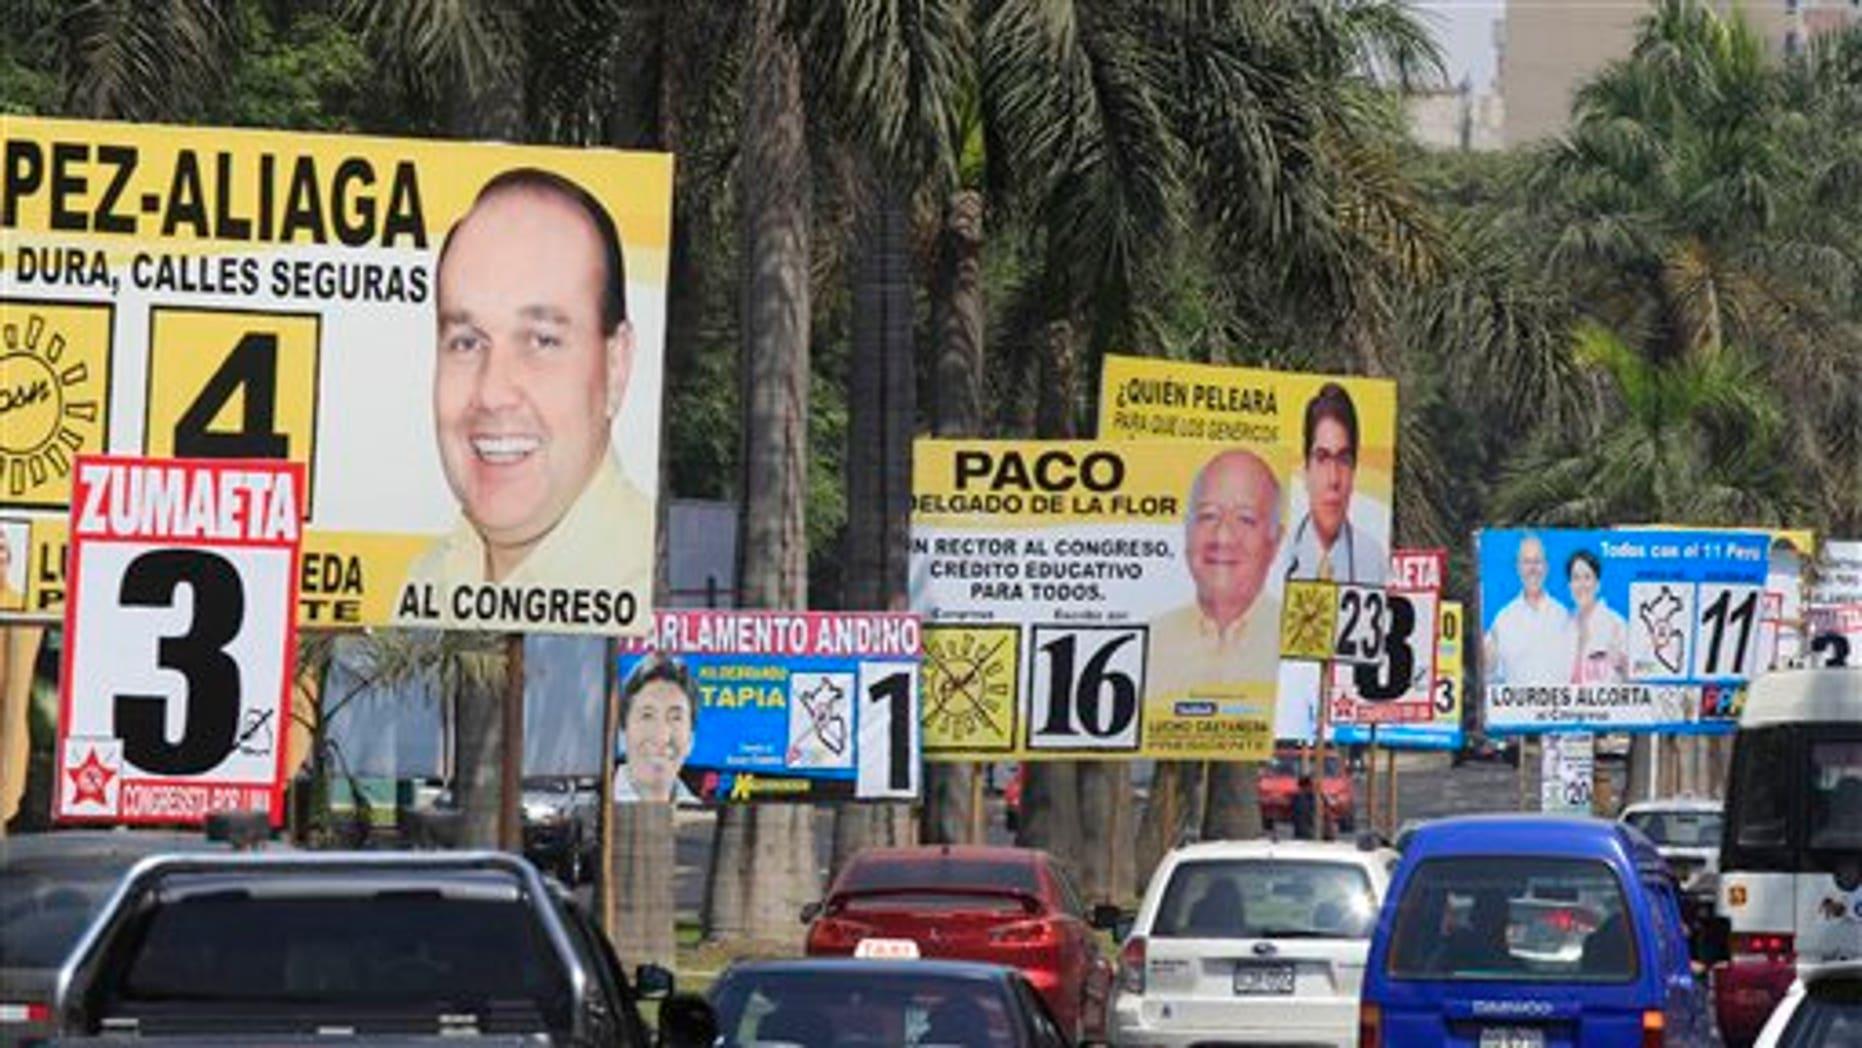 Cars drive past political campaign signs in Lima, Peru, Saturday April 9, 2011.  (AP Photo/Martin Mejia)